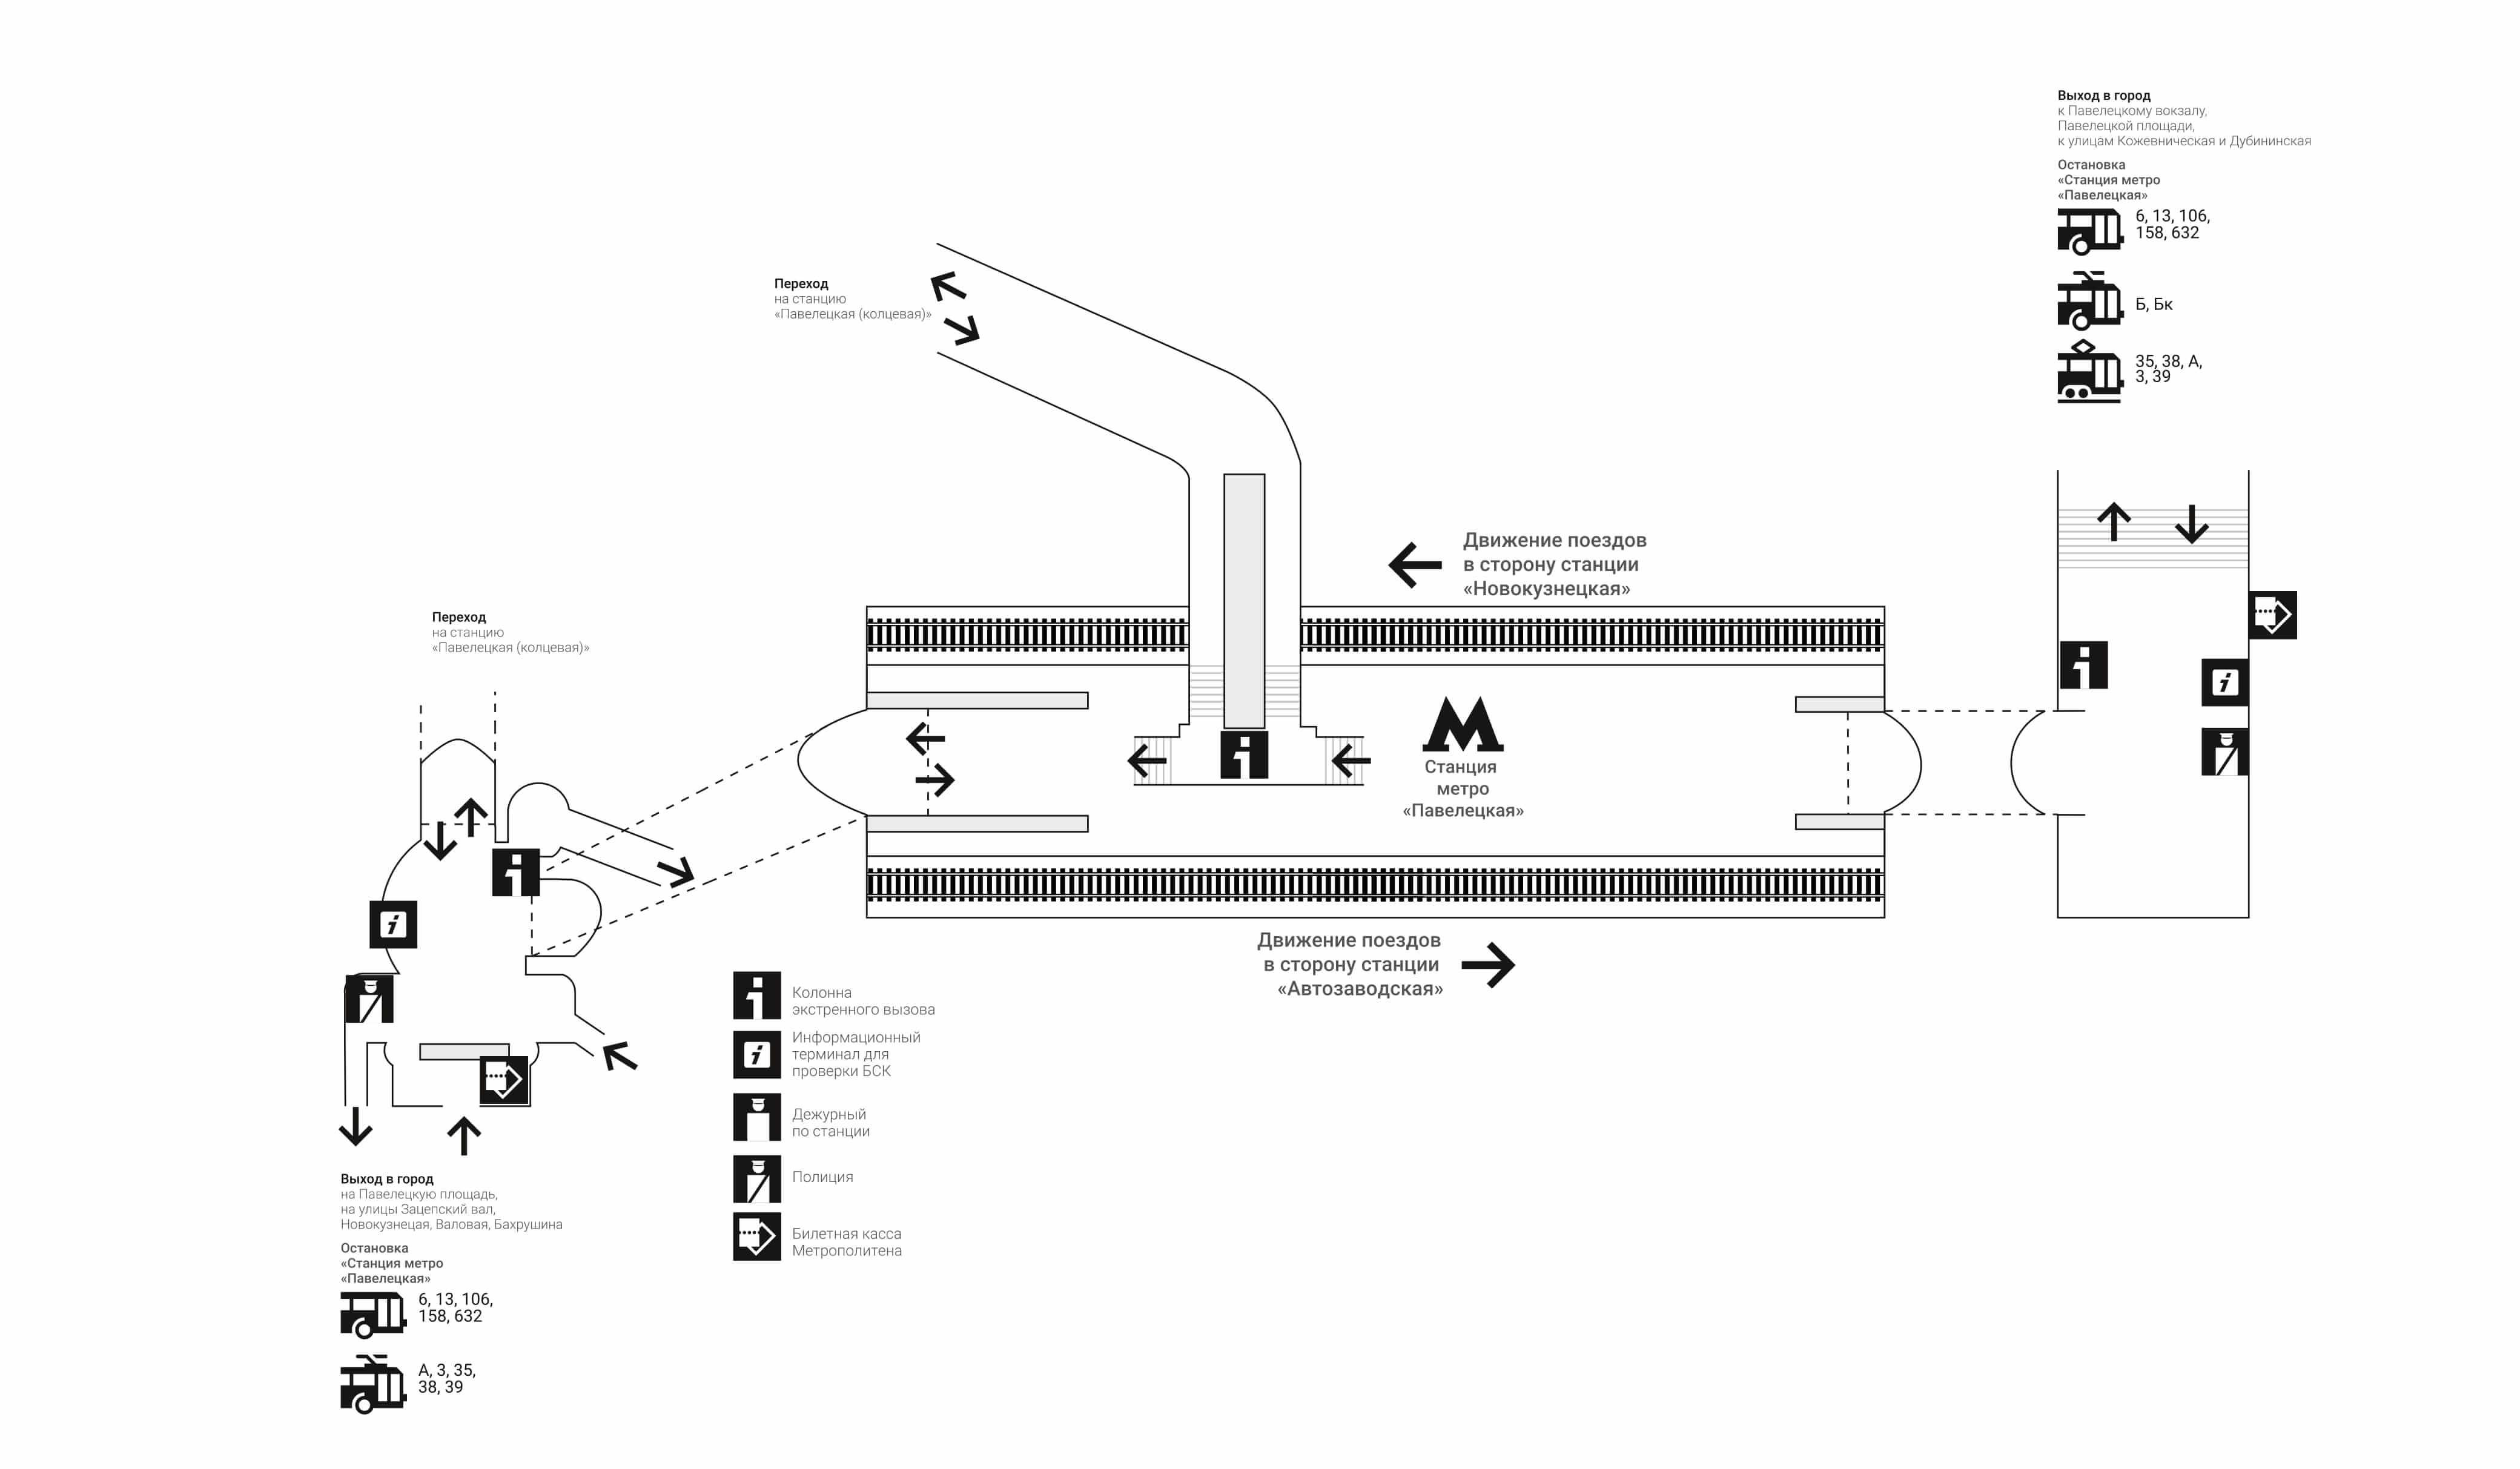 Павелецкий вокзал станция метро схема фото 553